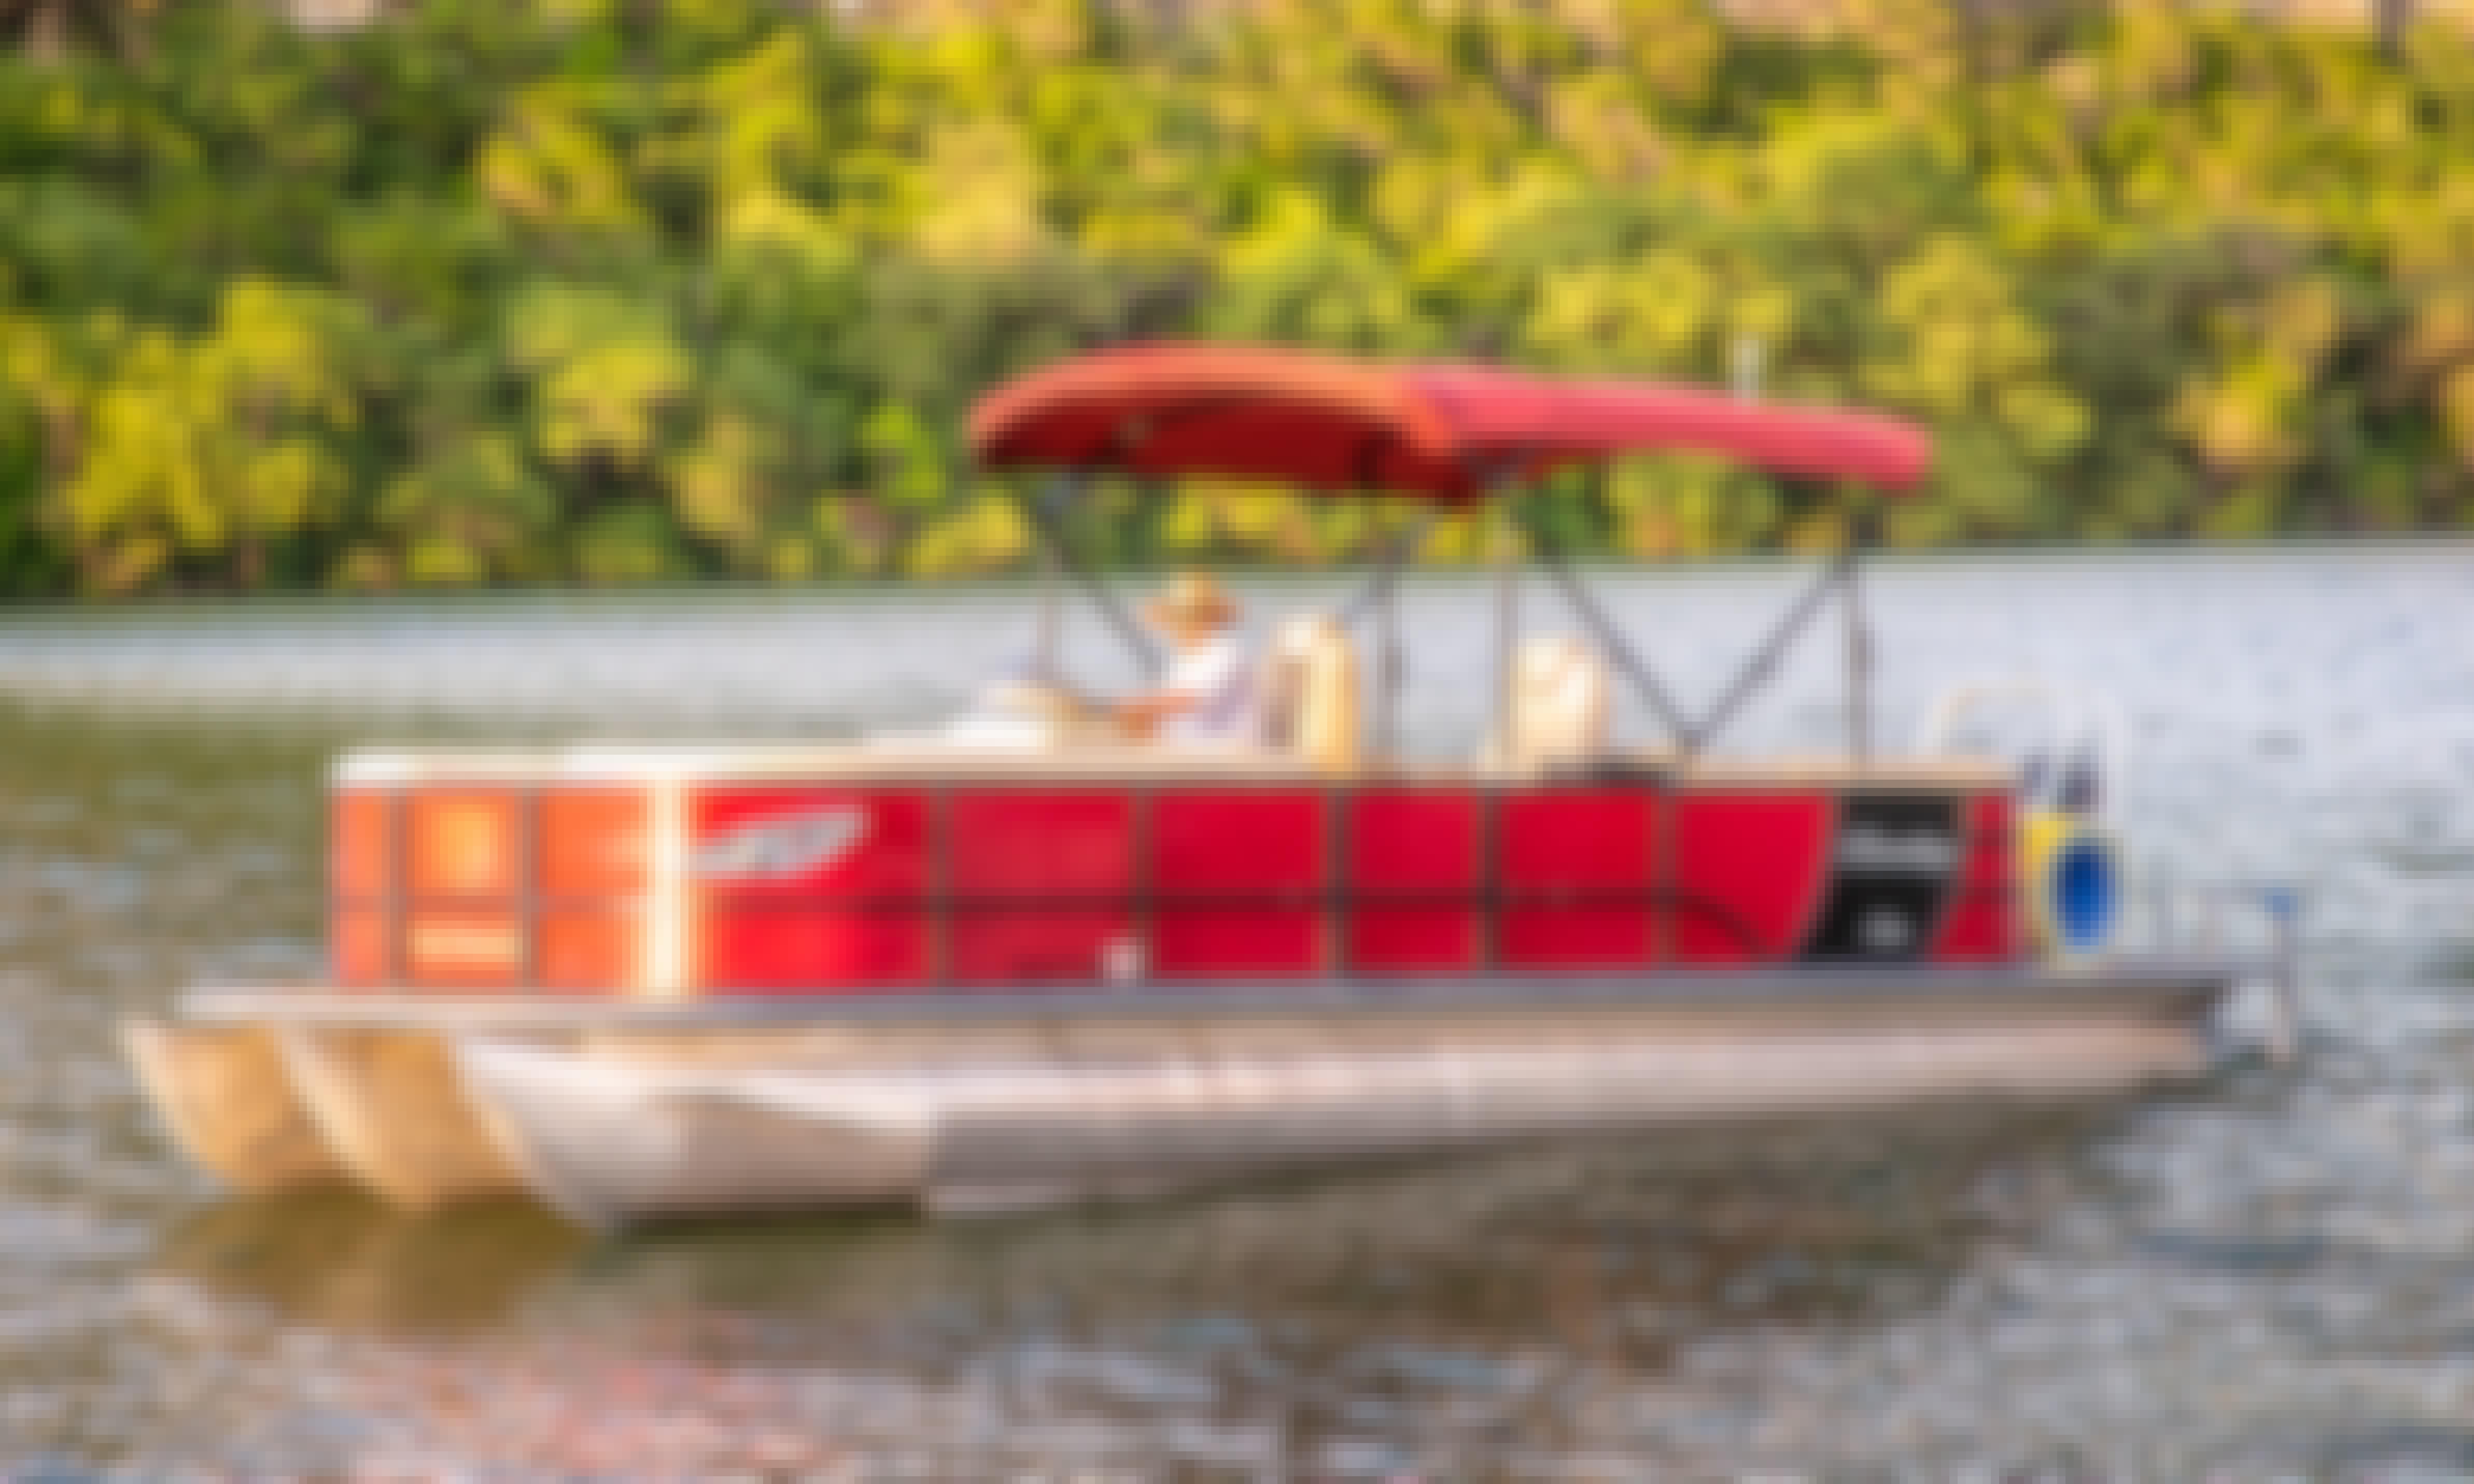 Lake Austin Boat Rental⎮Clean & Pristine Pontoons⎮VIP Service at Laid Back Prices